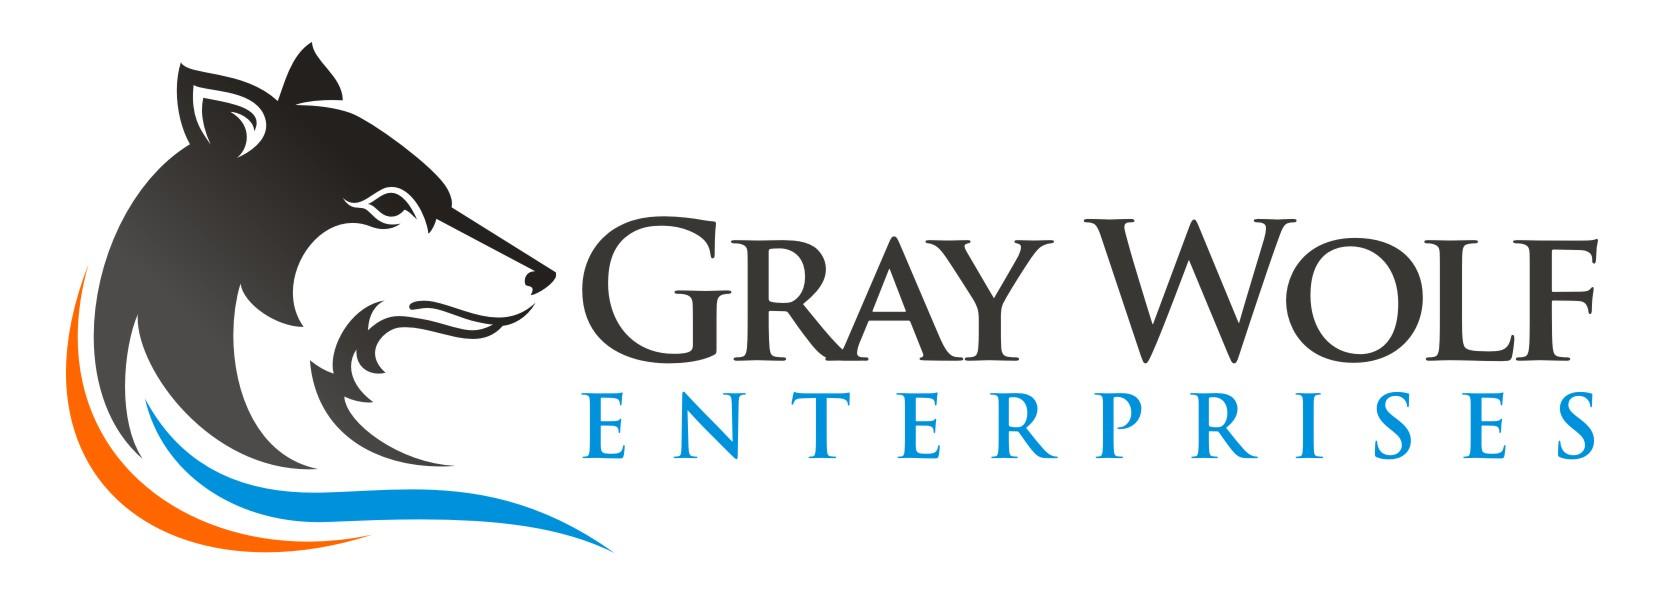 Gray Wolf Enteprises